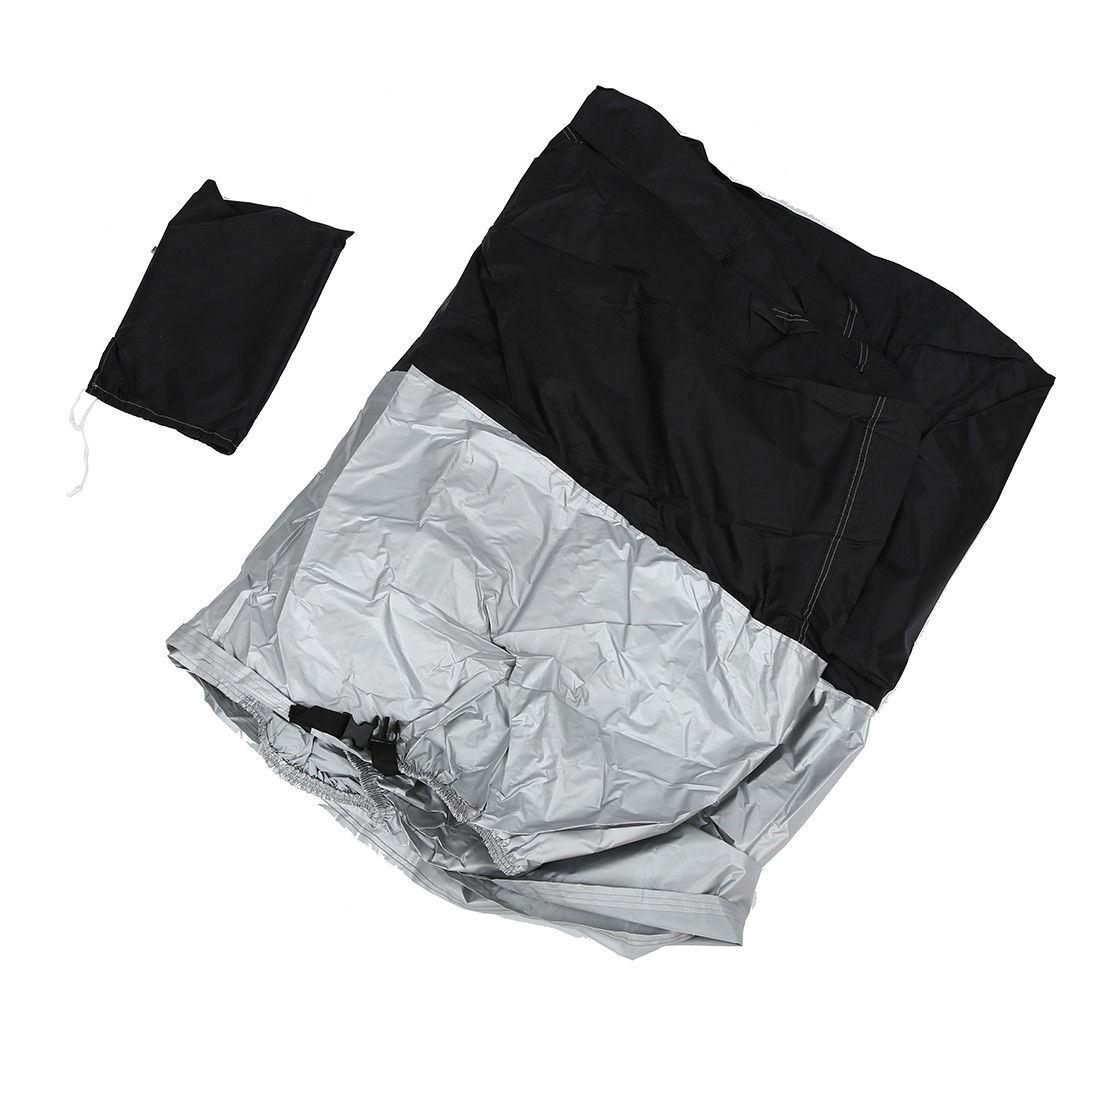 Funda-Impermeable-Protectora-Cubre-Moto-Cosida-Muy-Resistente-Tallas-M-XXL miniatura 7